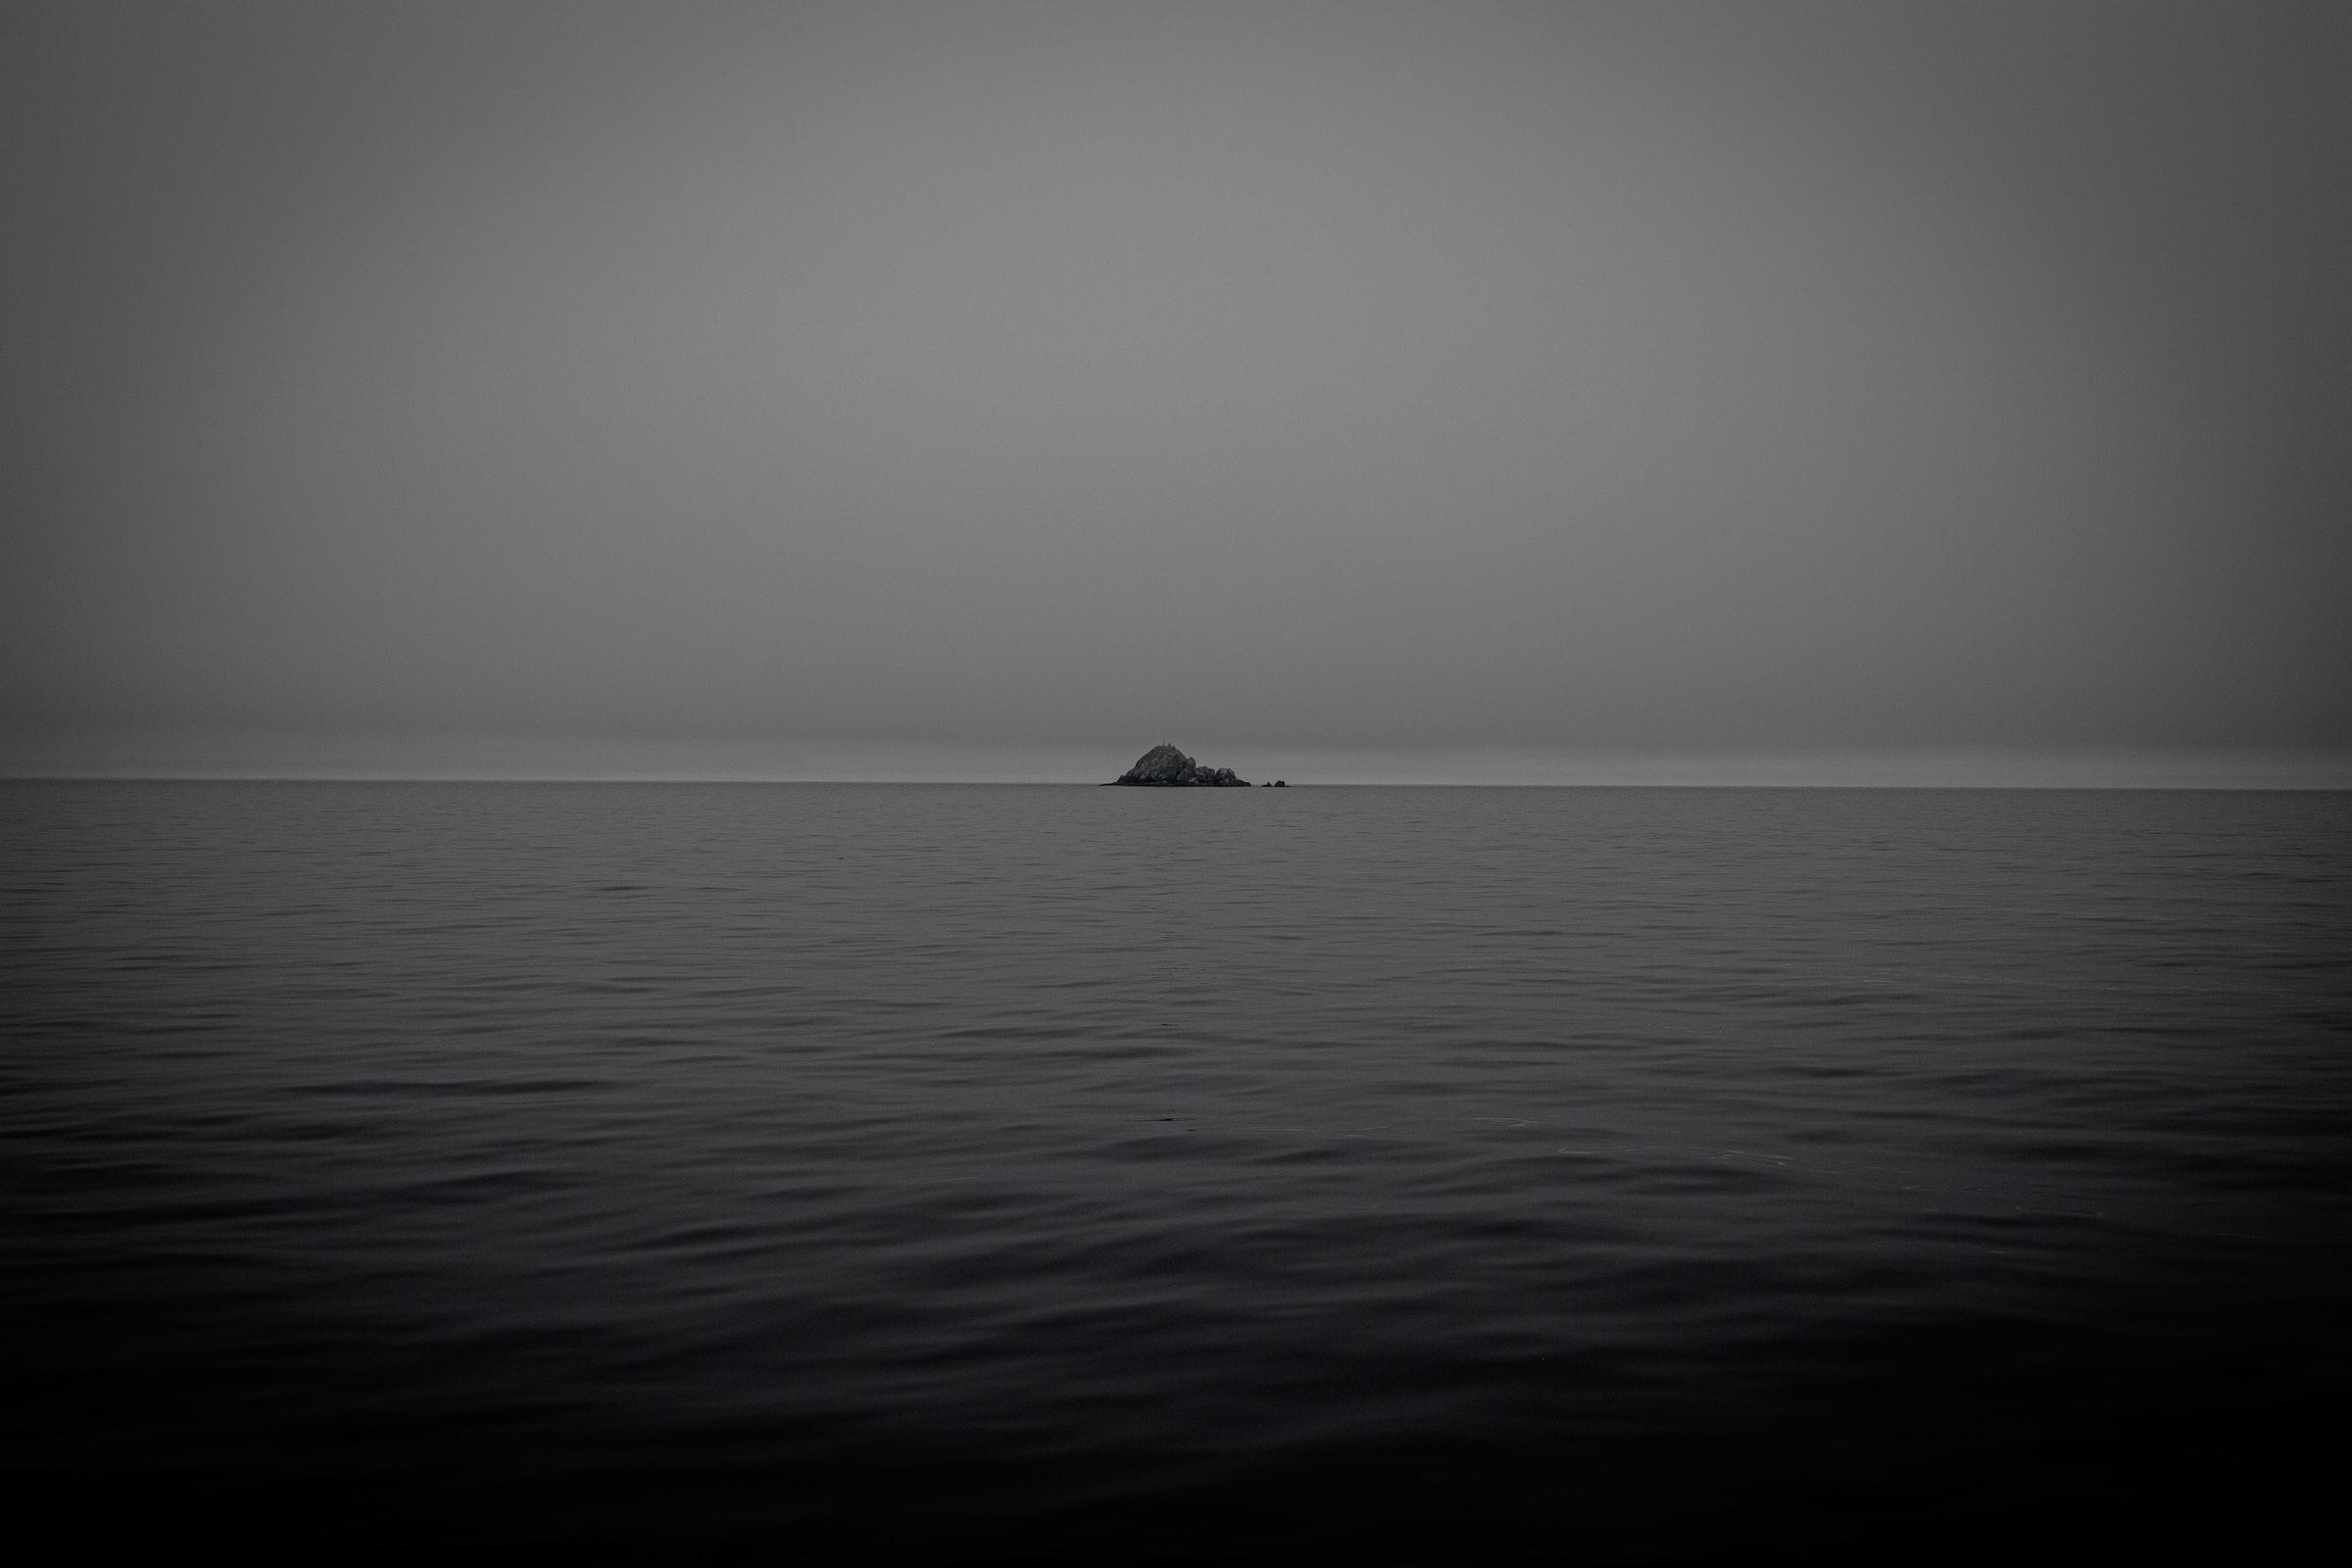 Landsicht am Ende des Horizonts